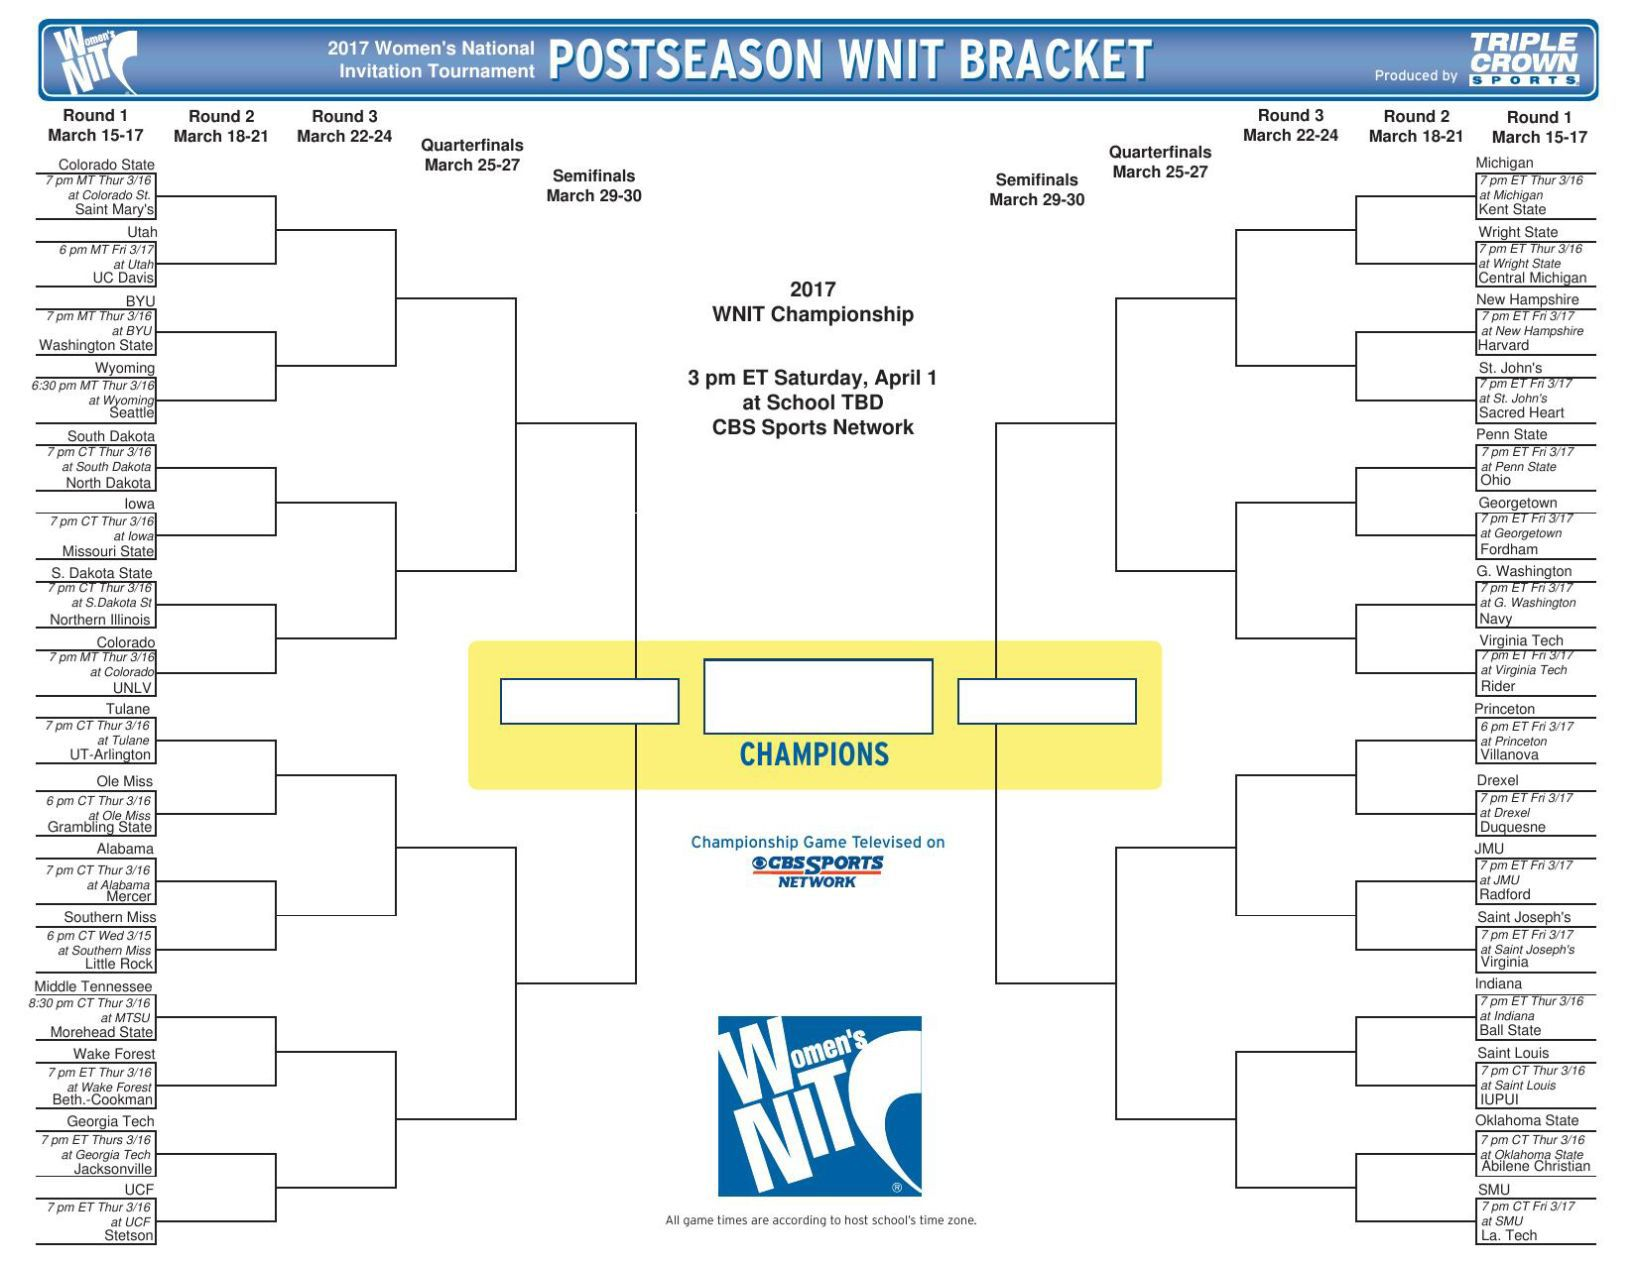 photo about Nit Printable Bracket known as 2017 WNIT bracket Iowa Hawkeyes Basketball